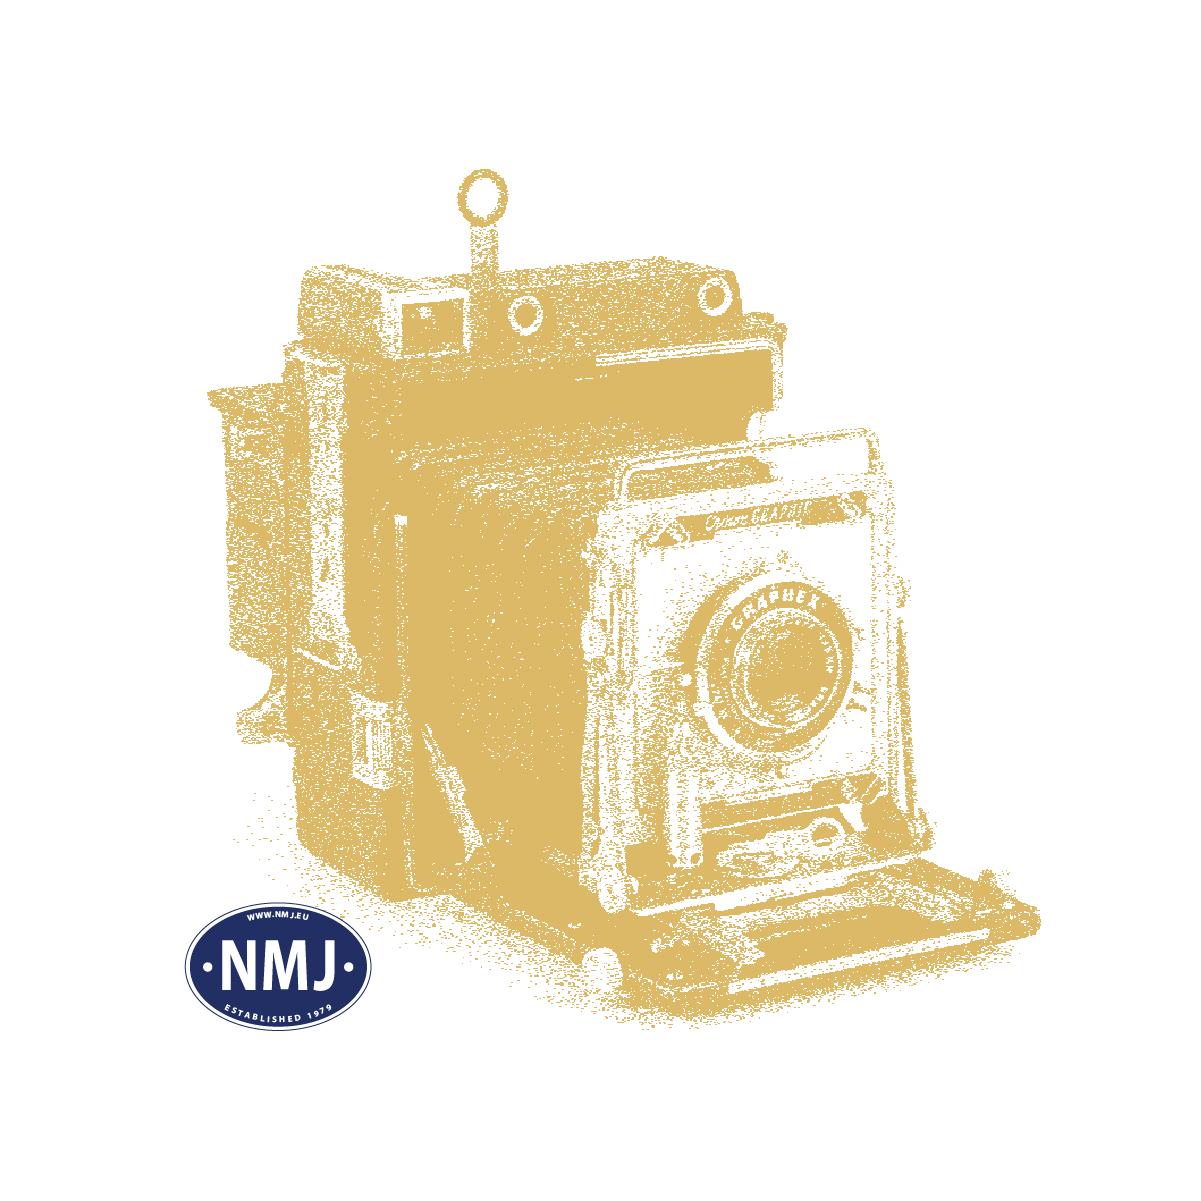 NMJE501439 - NMJ Exclusive SZD WLABm UIC Y, Kopenhagen-Moskau, Schlafwagen